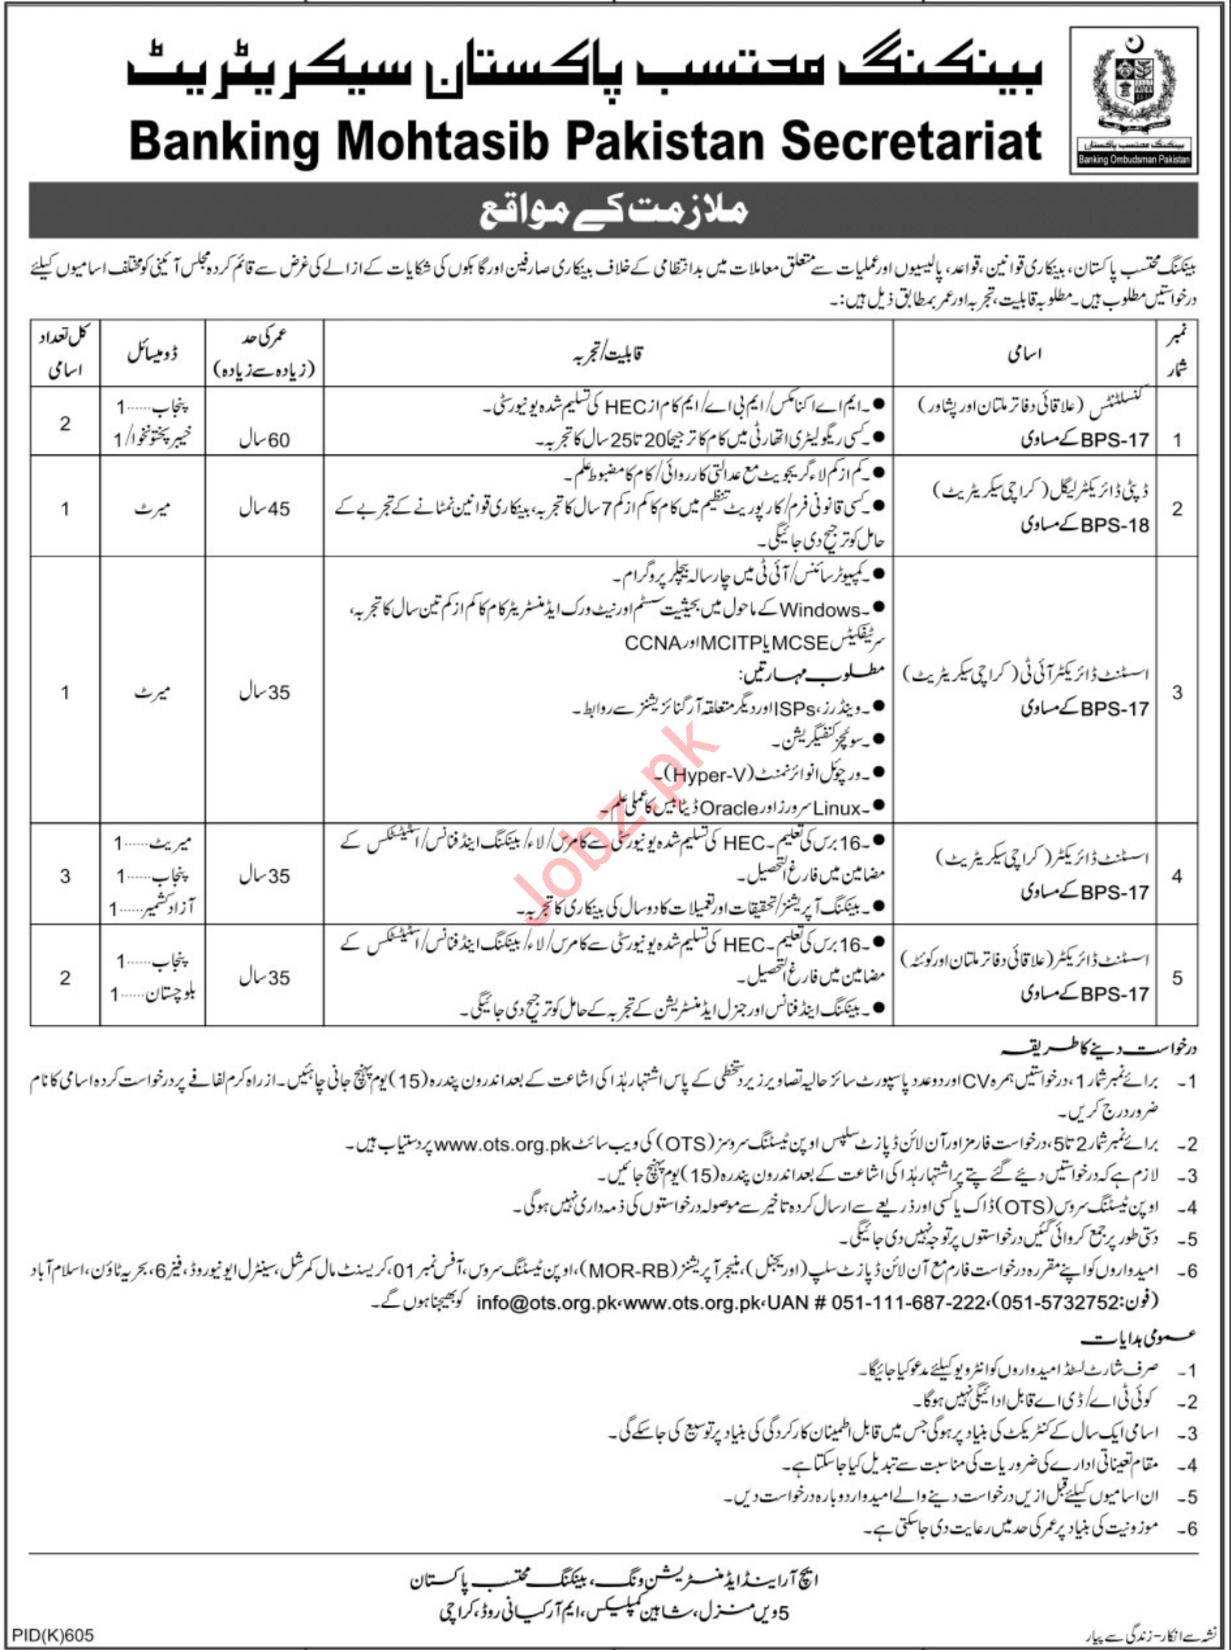 Banking Mohtasib Pakistan Secretariat Karachi Jobs 2019